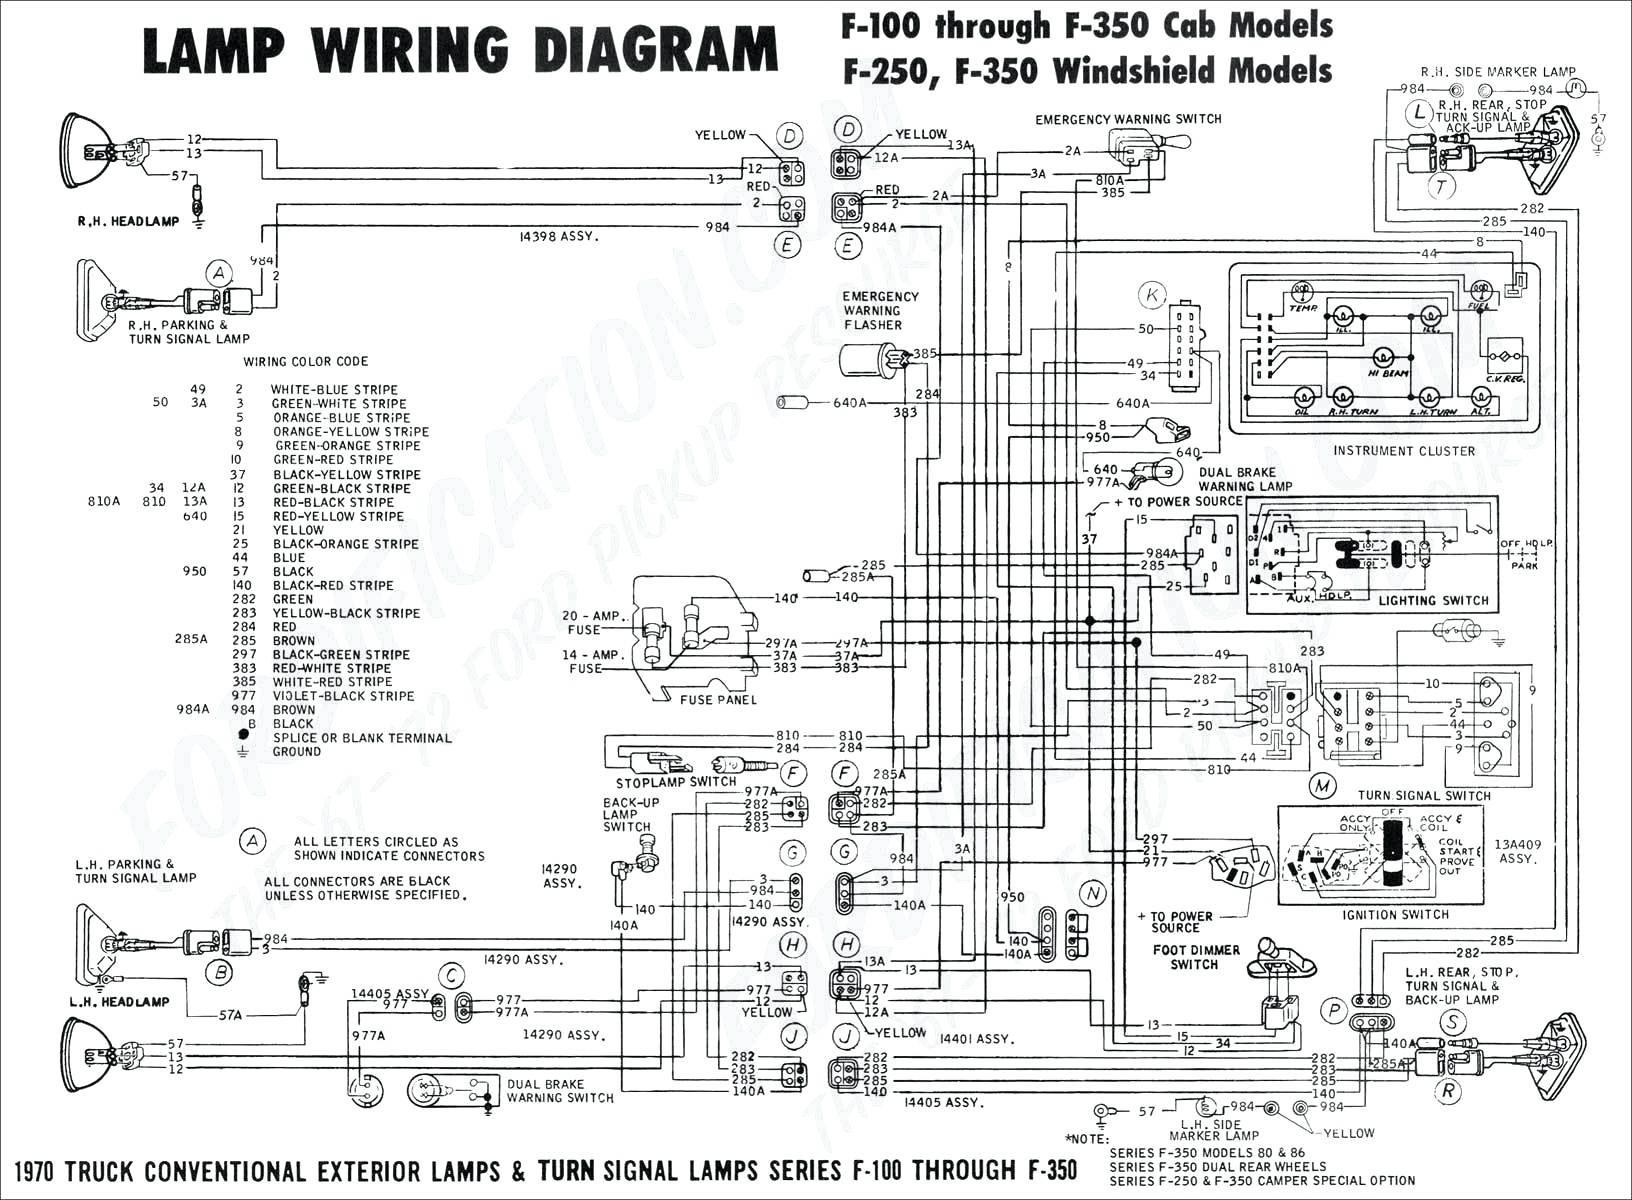 2000 Infiniti I30 Engine Diagram 1995 Nissan Maxima Engine Diagram Experts Wiring Diagram • Of 2000 Infiniti I30 Engine Diagram